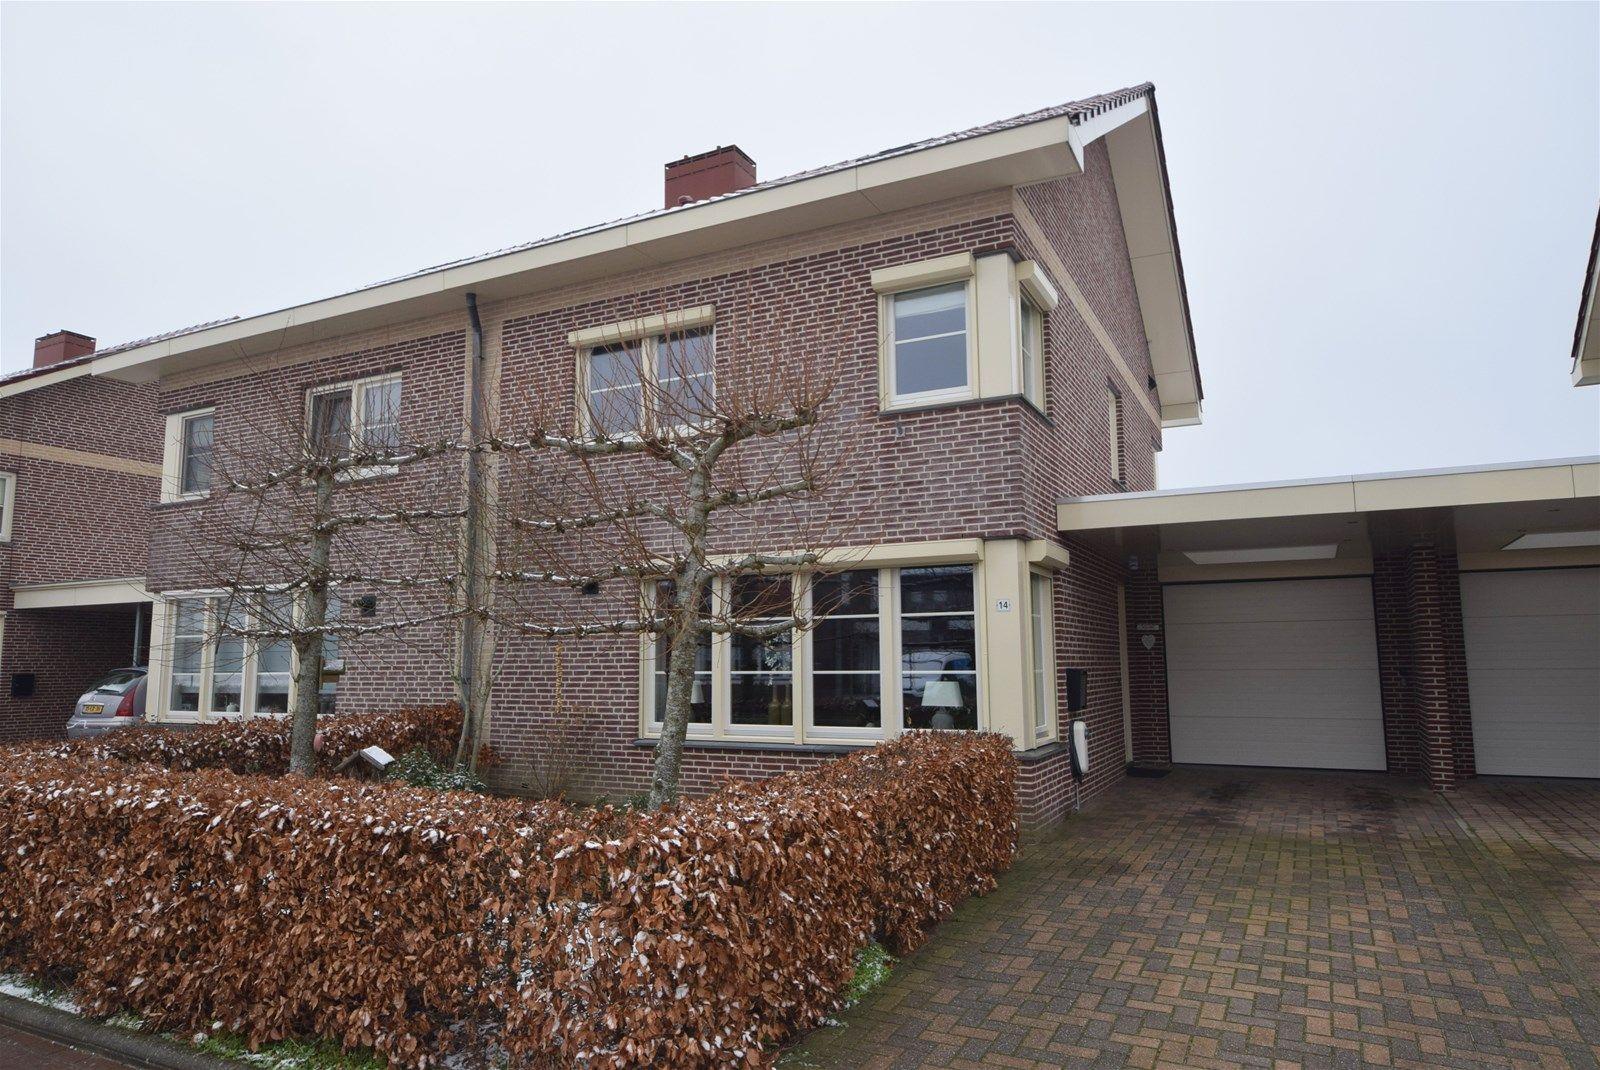 Pinksterbloemweg 14, Havelte